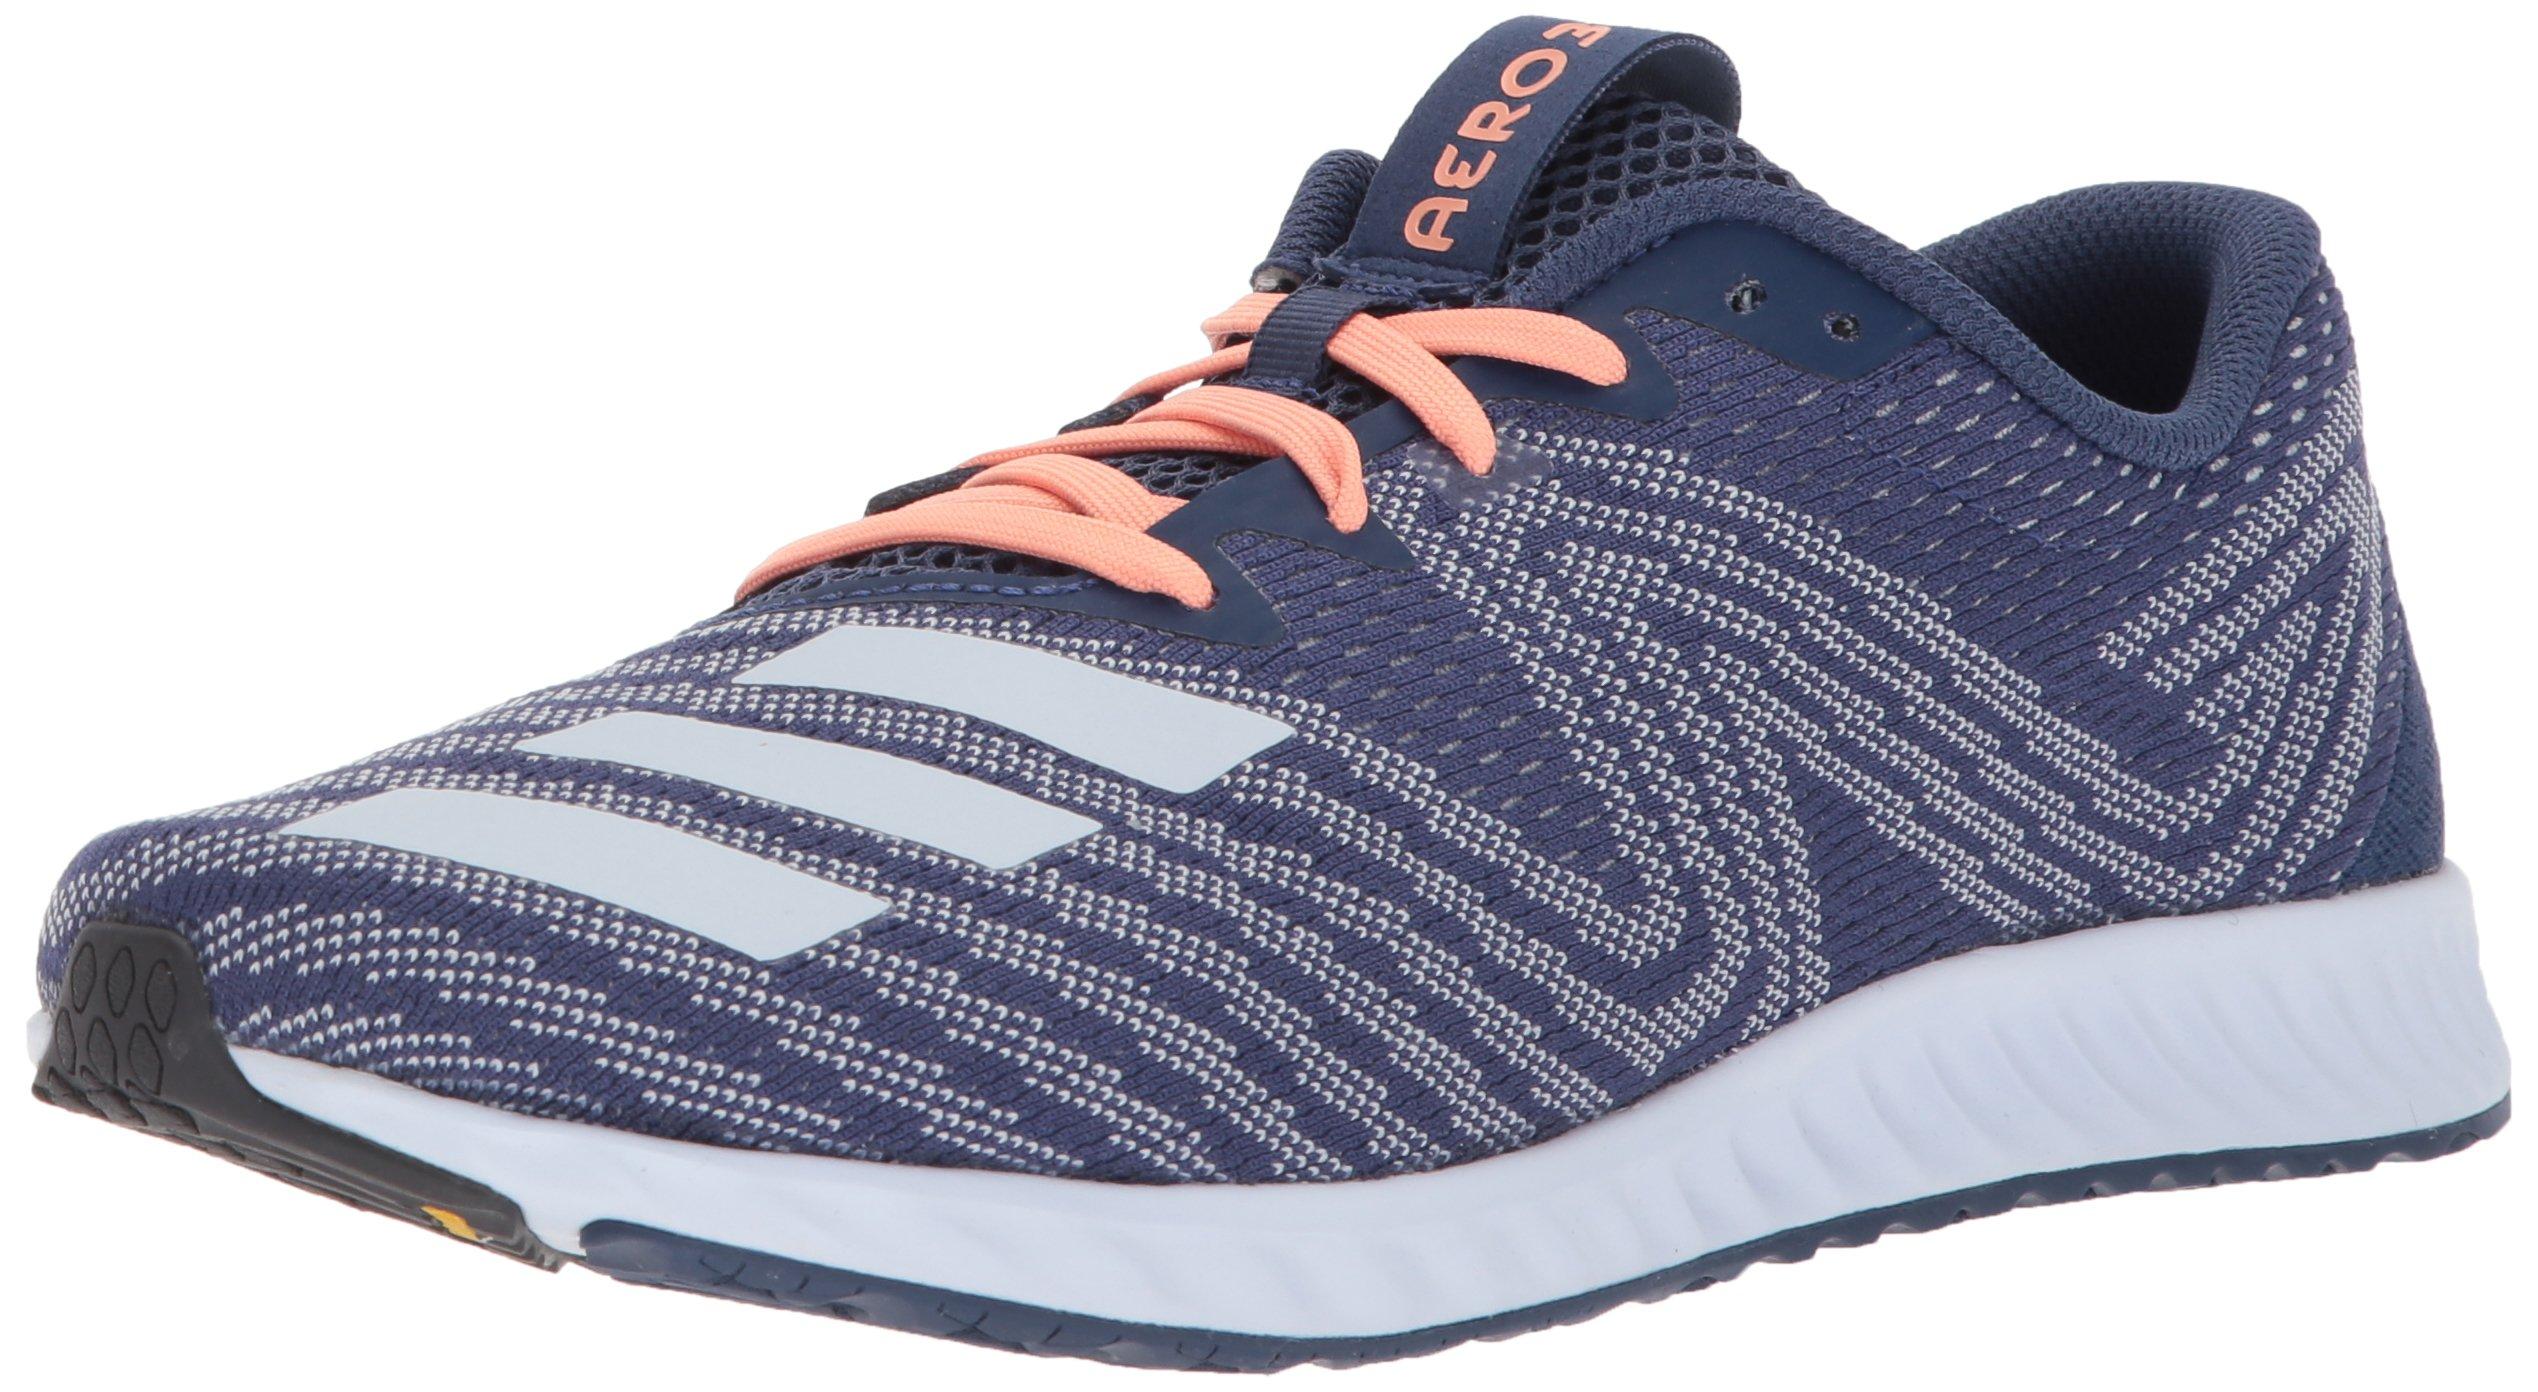 detailed look bf9ae c1fb8 Galleon - Adidas Womens Aerobounce Pr W Running Shoe Aero BlueNoble  Indigo, 6 M US